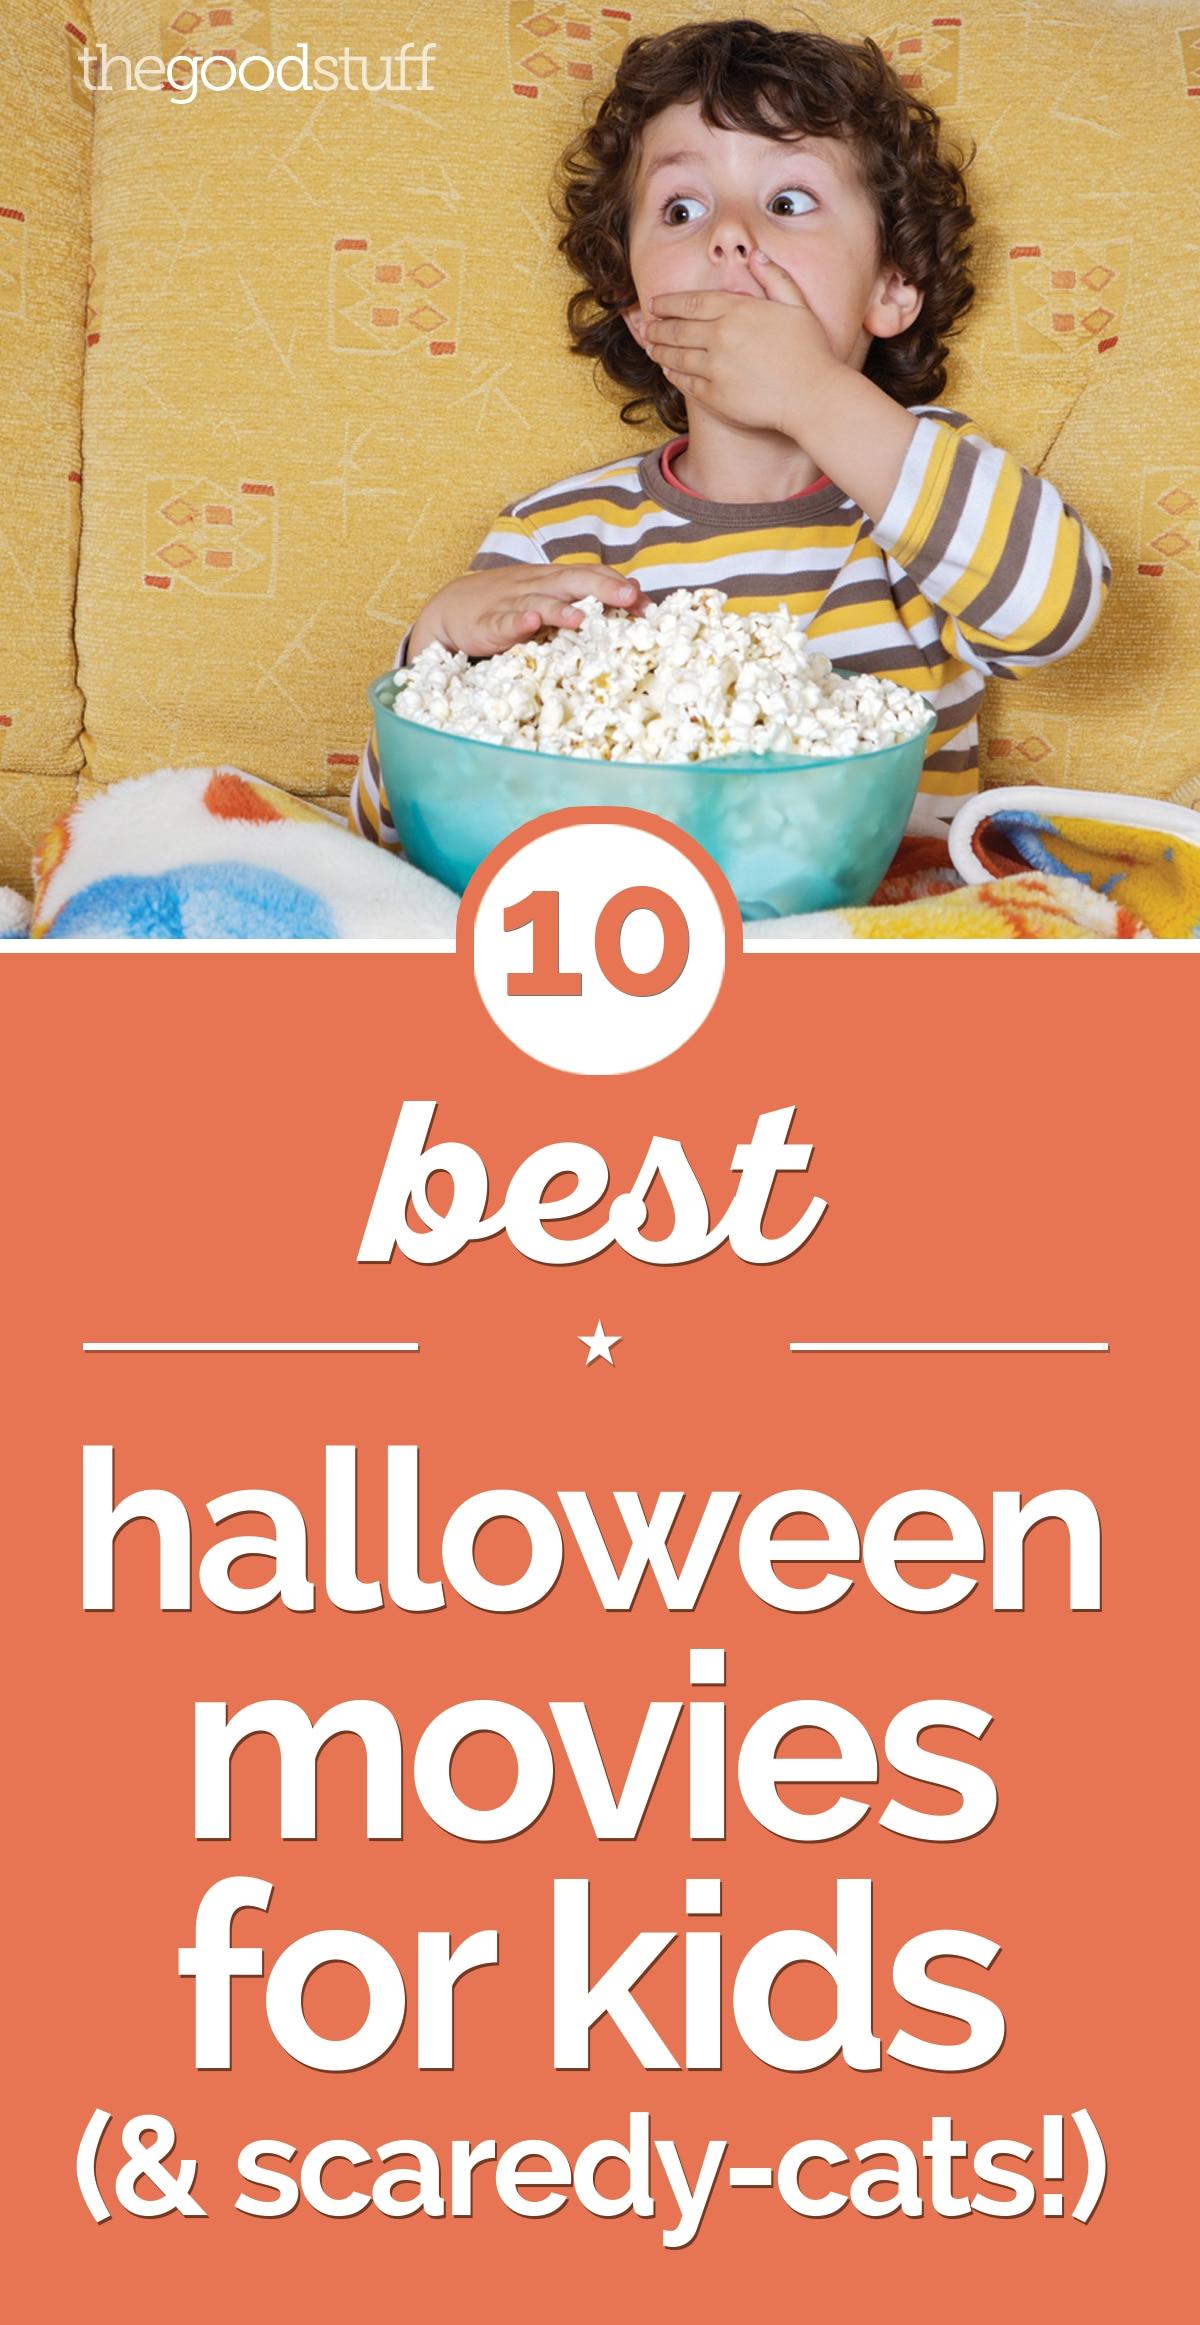 10 Best Halloween Movies for Kids (& Scaredy-Cats!) | thegoodstuff